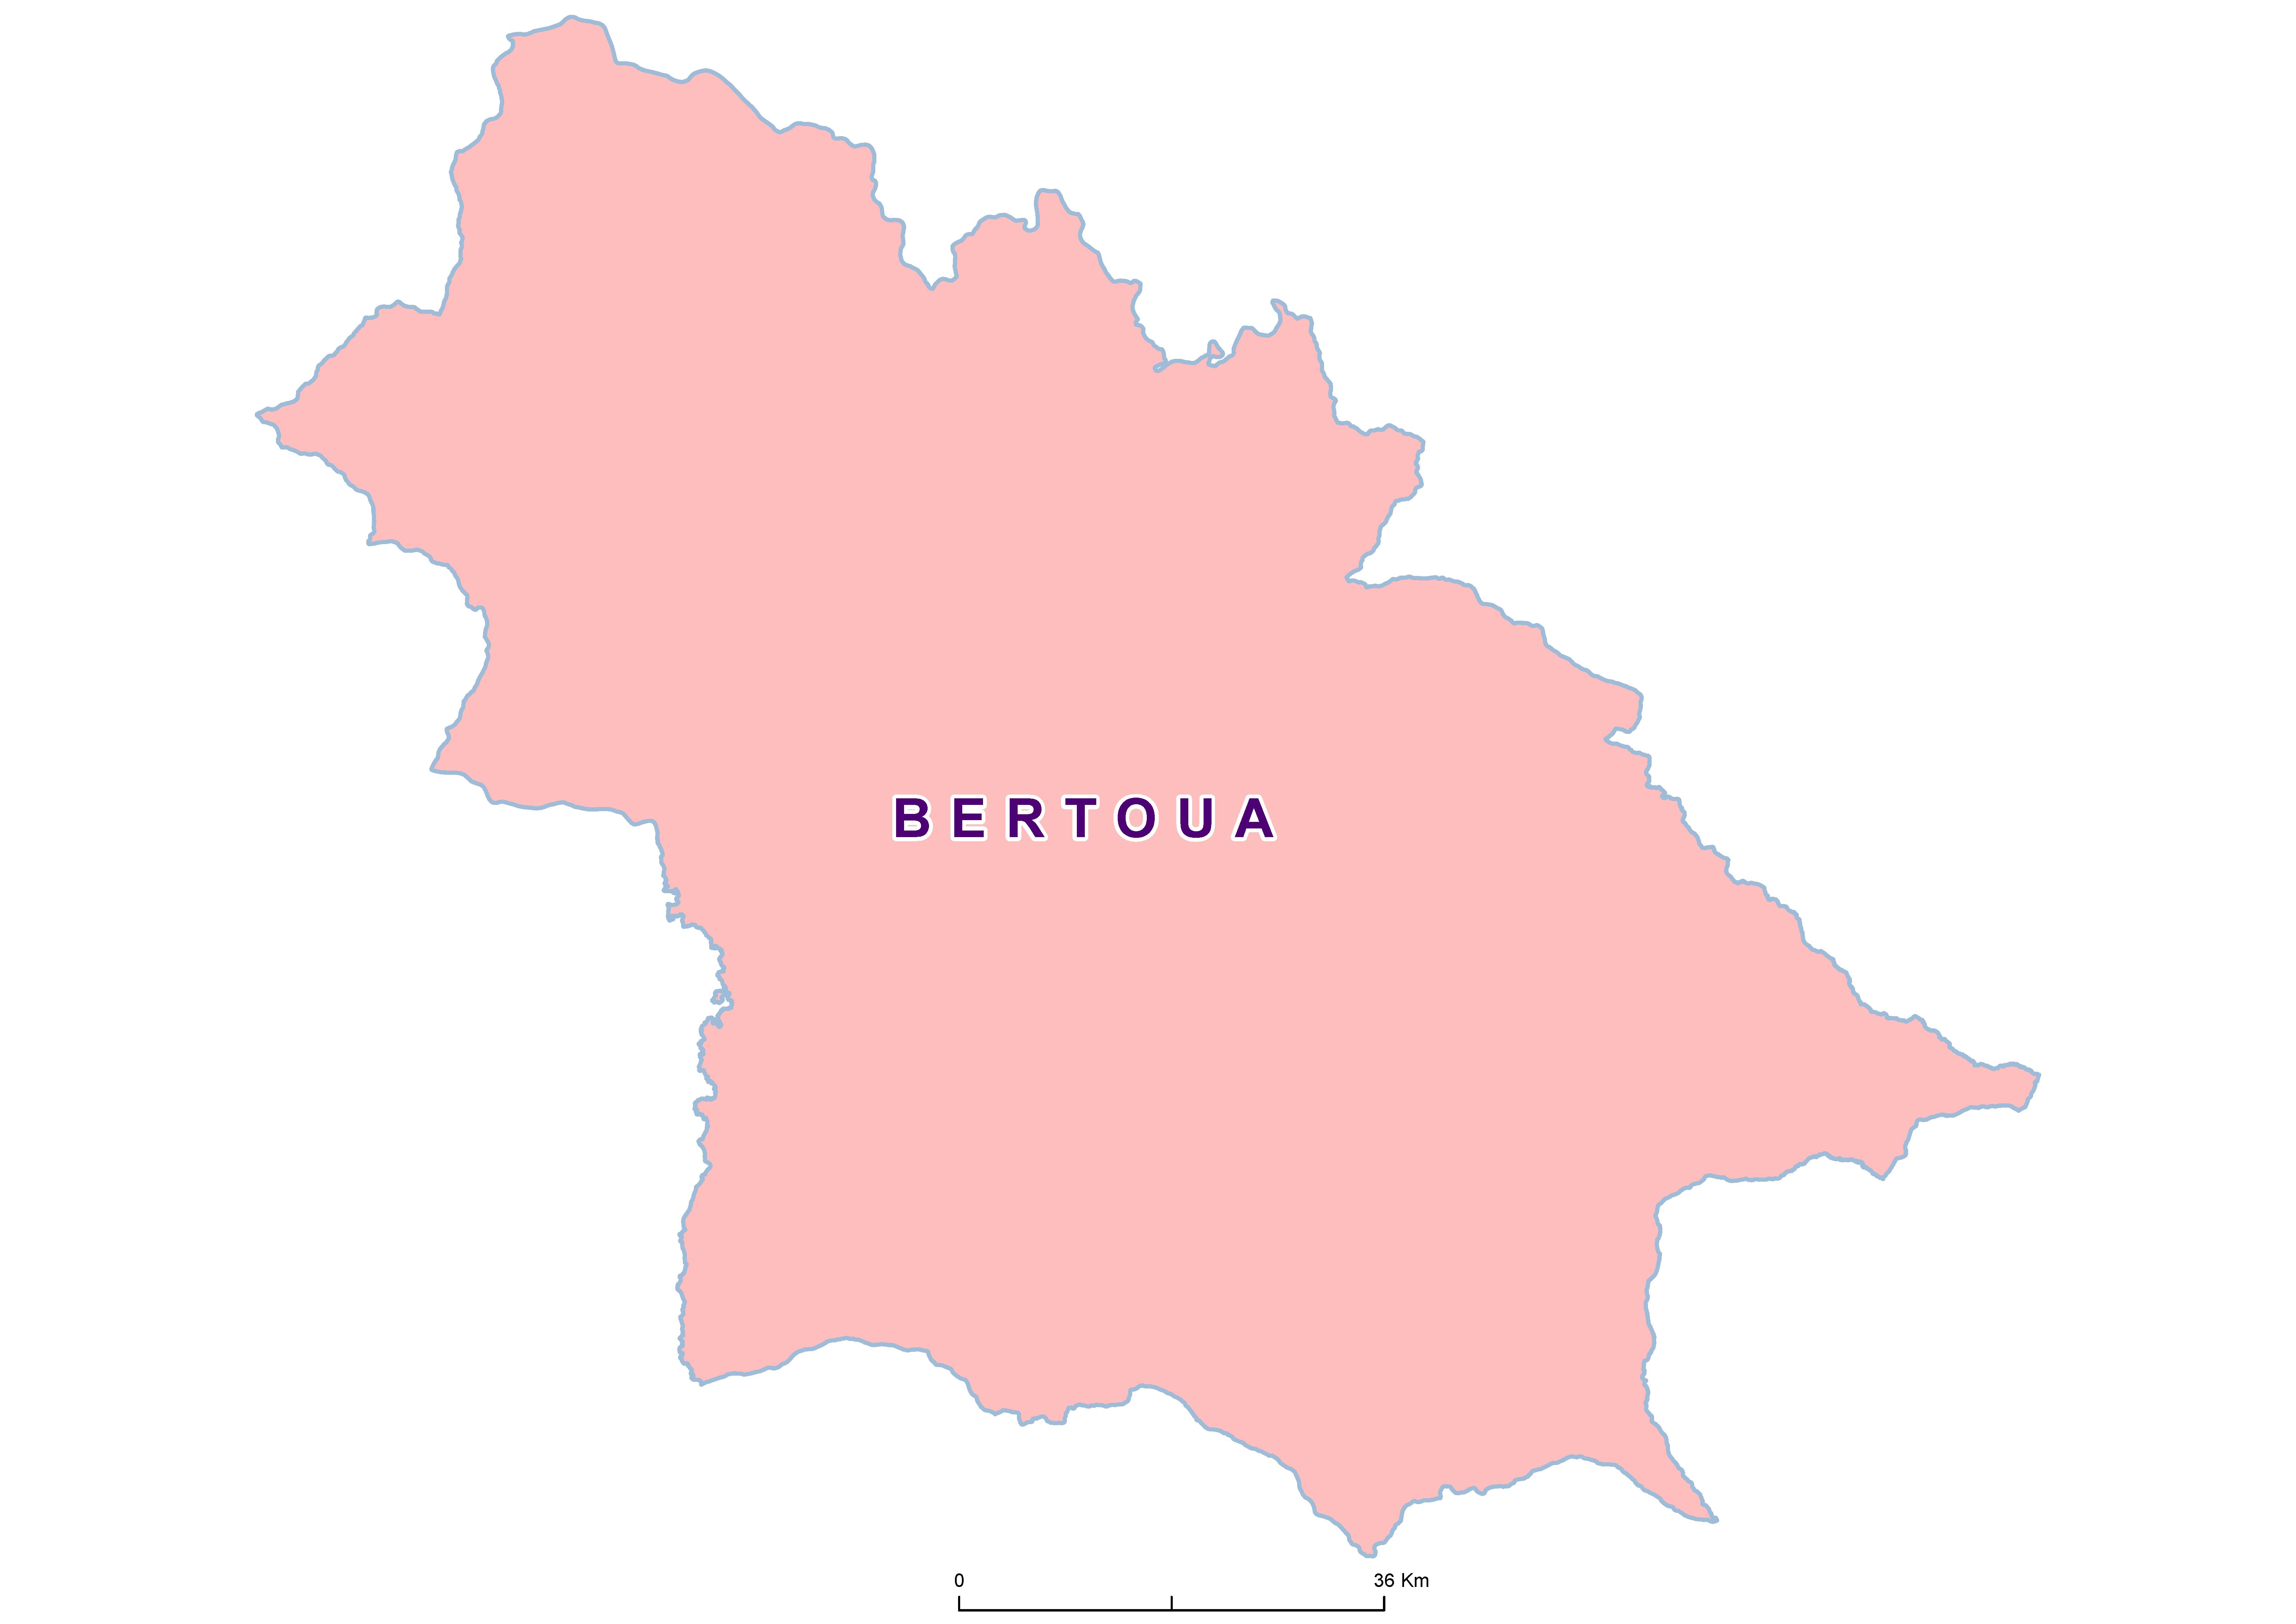 Bertoua Mean SCH 20100001